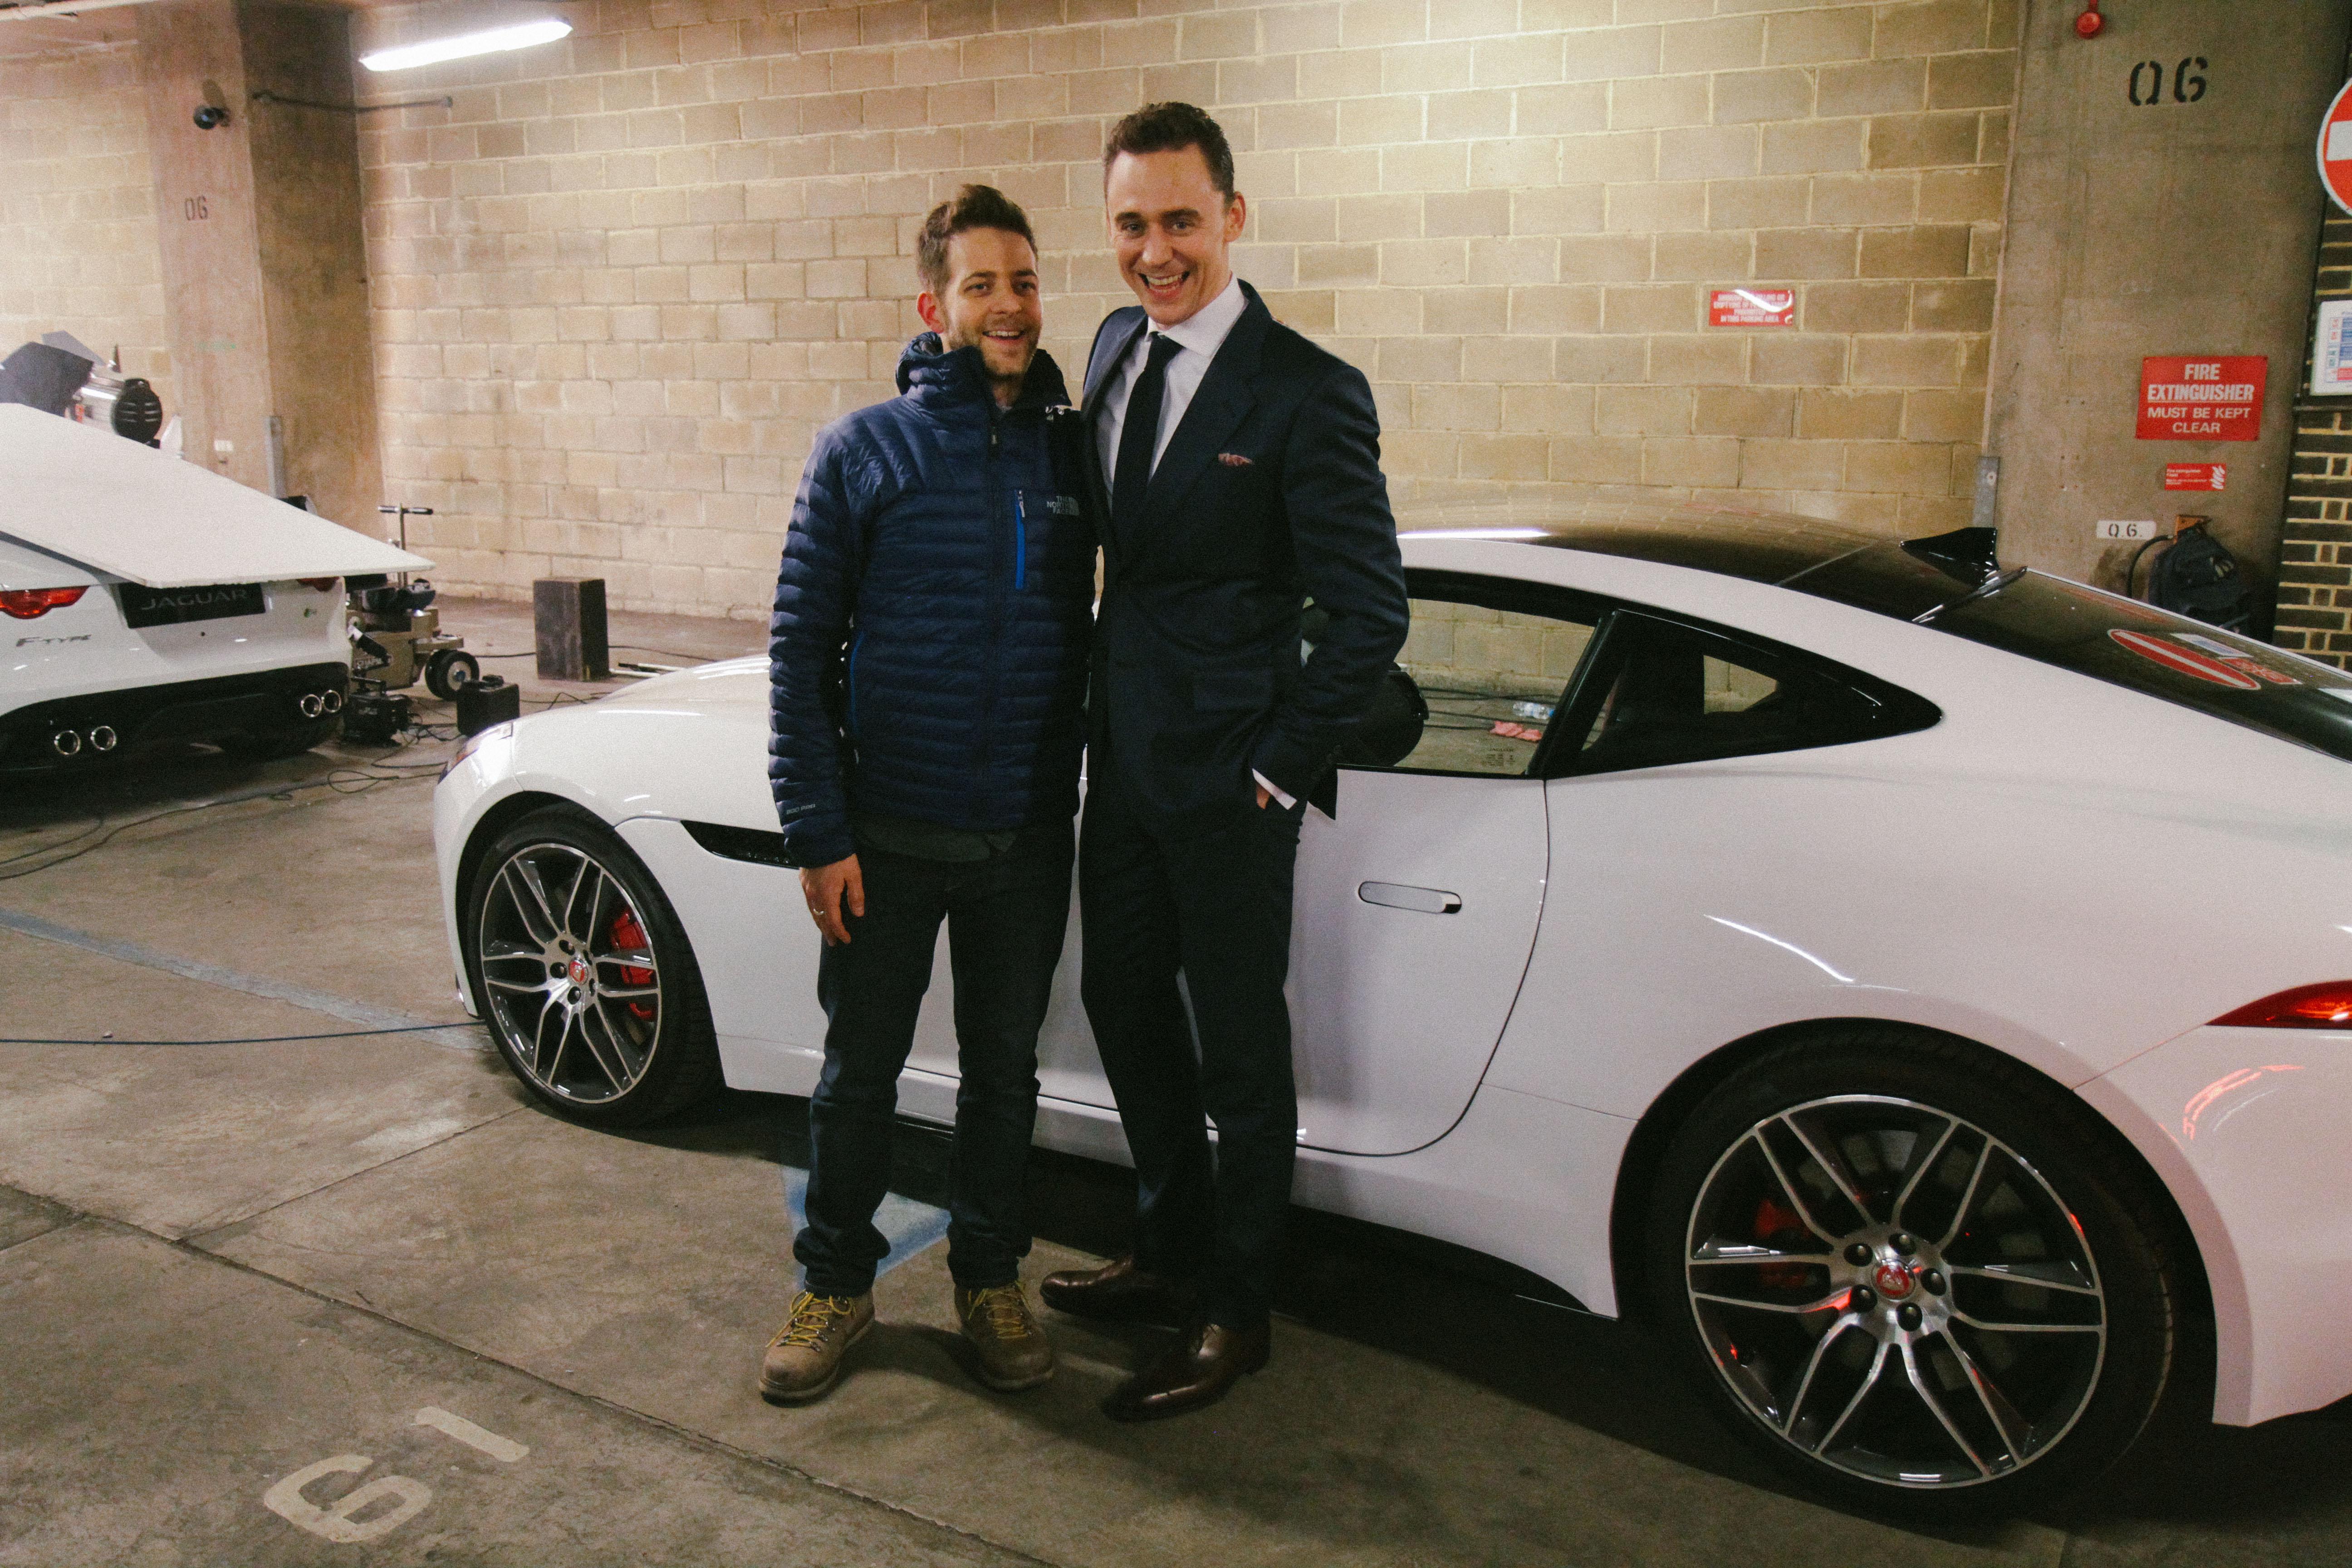 Attractive File:Tom Hiddleston Jaguar Ad February 2014